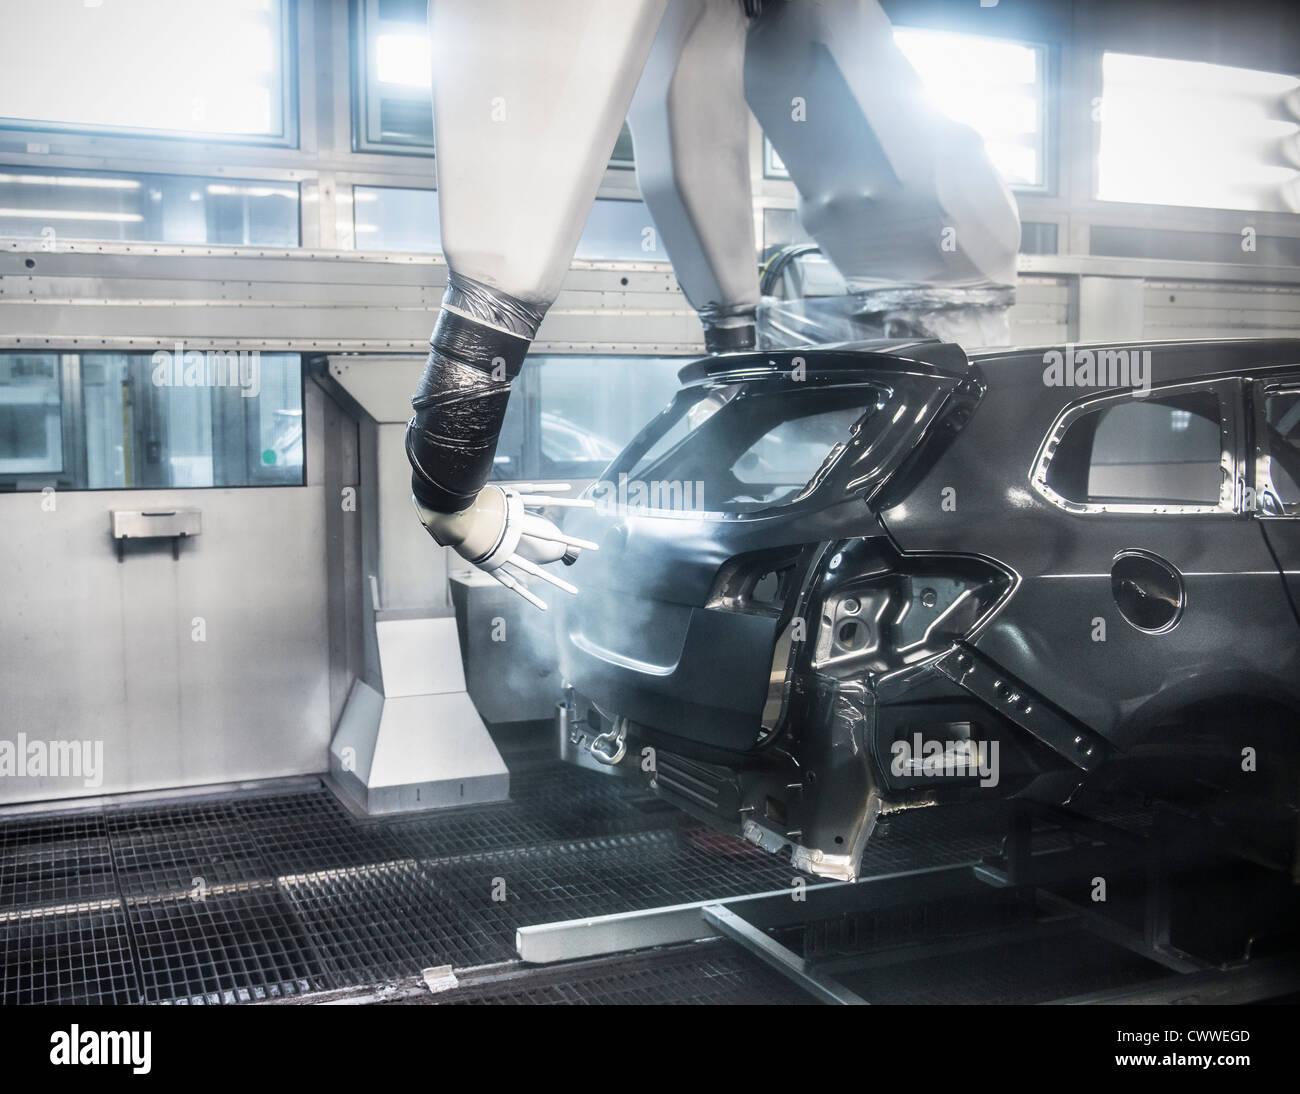 industrial robot stockfotos industrial robot bilder alamy. Black Bedroom Furniture Sets. Home Design Ideas